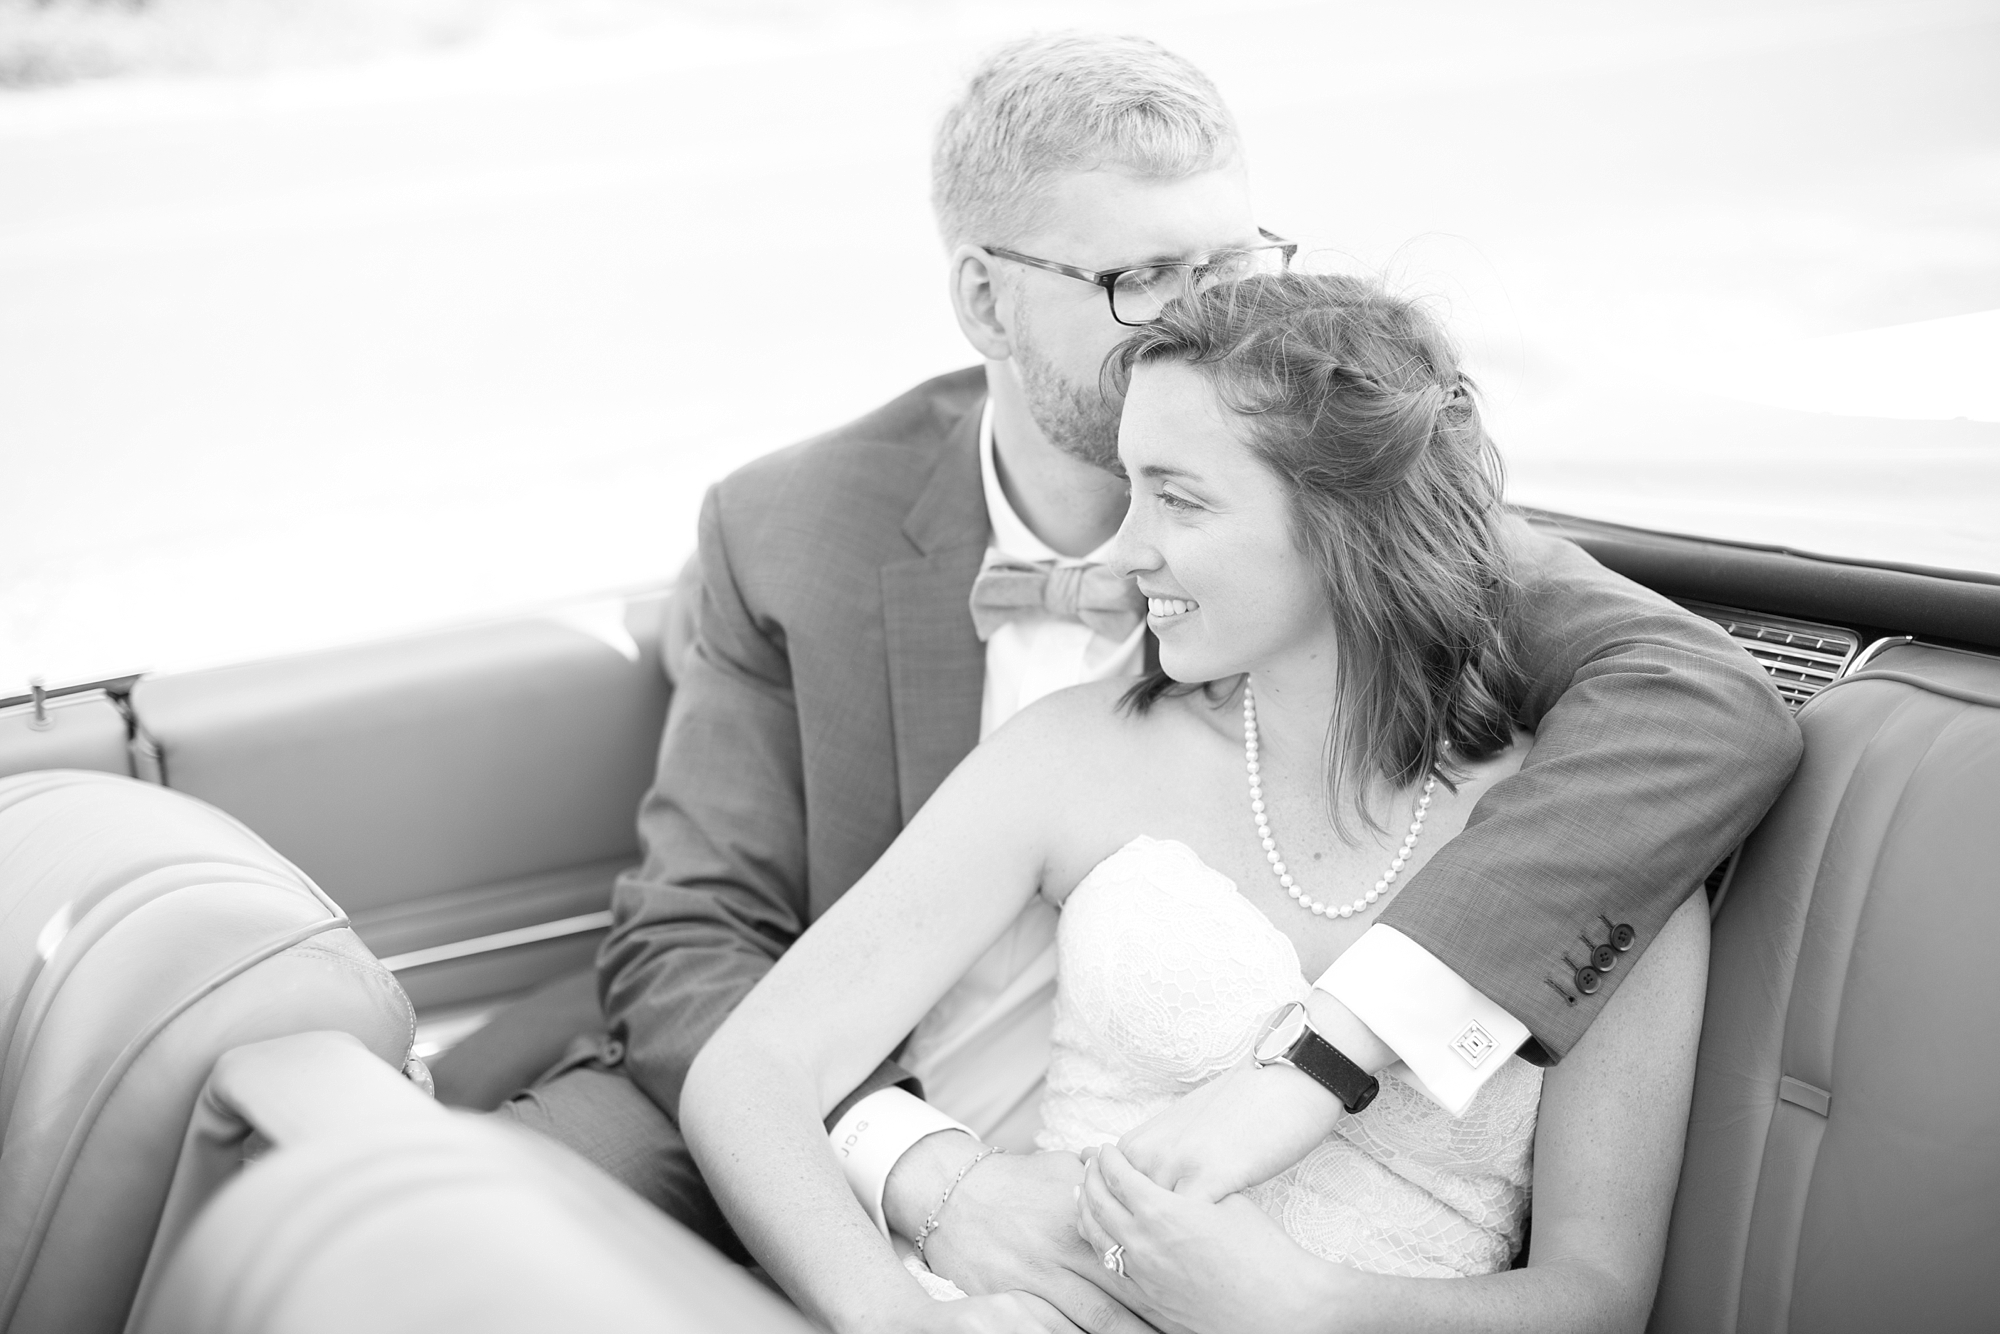 Goodman 3-Bride & Groom Portraits-859_anna grace photography wellfleet cape cod massachusetts destination wedding photographer Chequessett Yacht and Country Club wedding photo.jpg